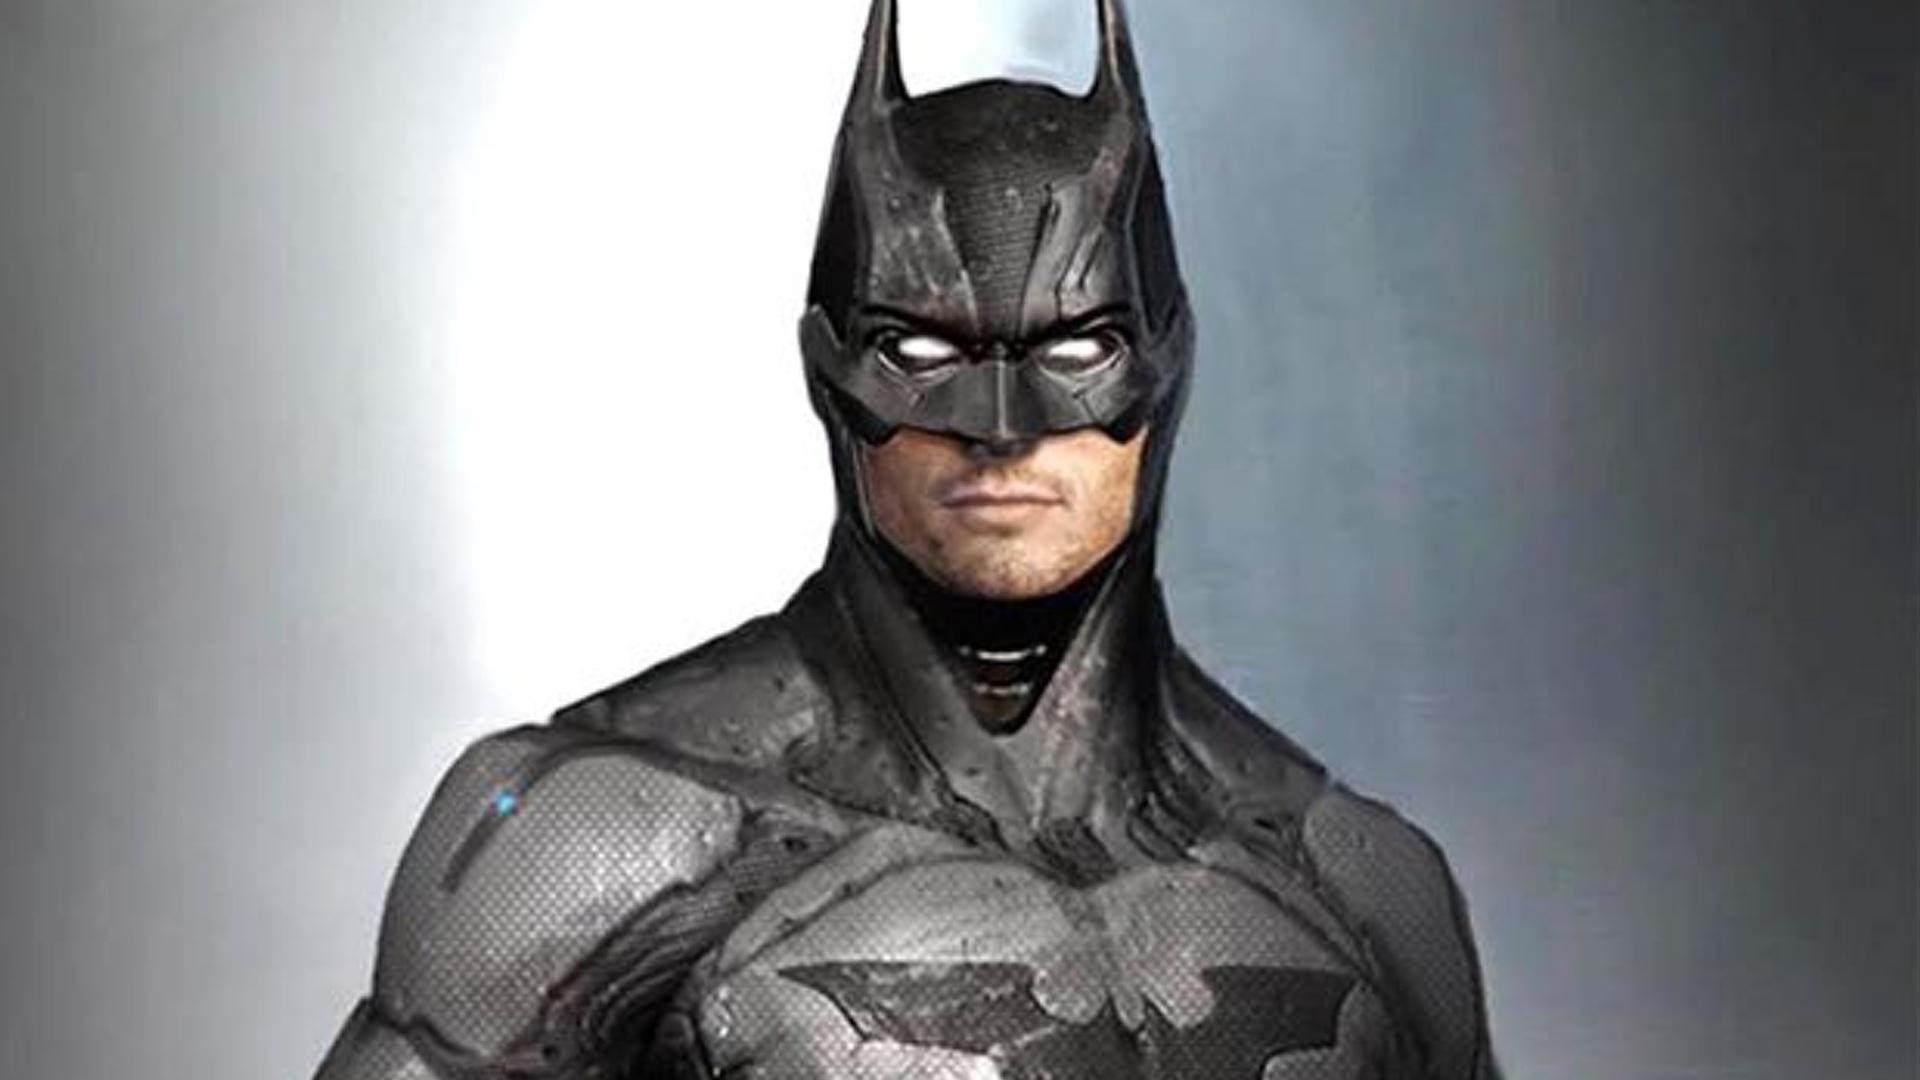 Alternate Batman Designs Revealed in Concept Art for BATMAN V SUPERMAN u2014 GeekTyrant & Alternate Batman Designs Revealed in Concept Art for BATMAN V ...